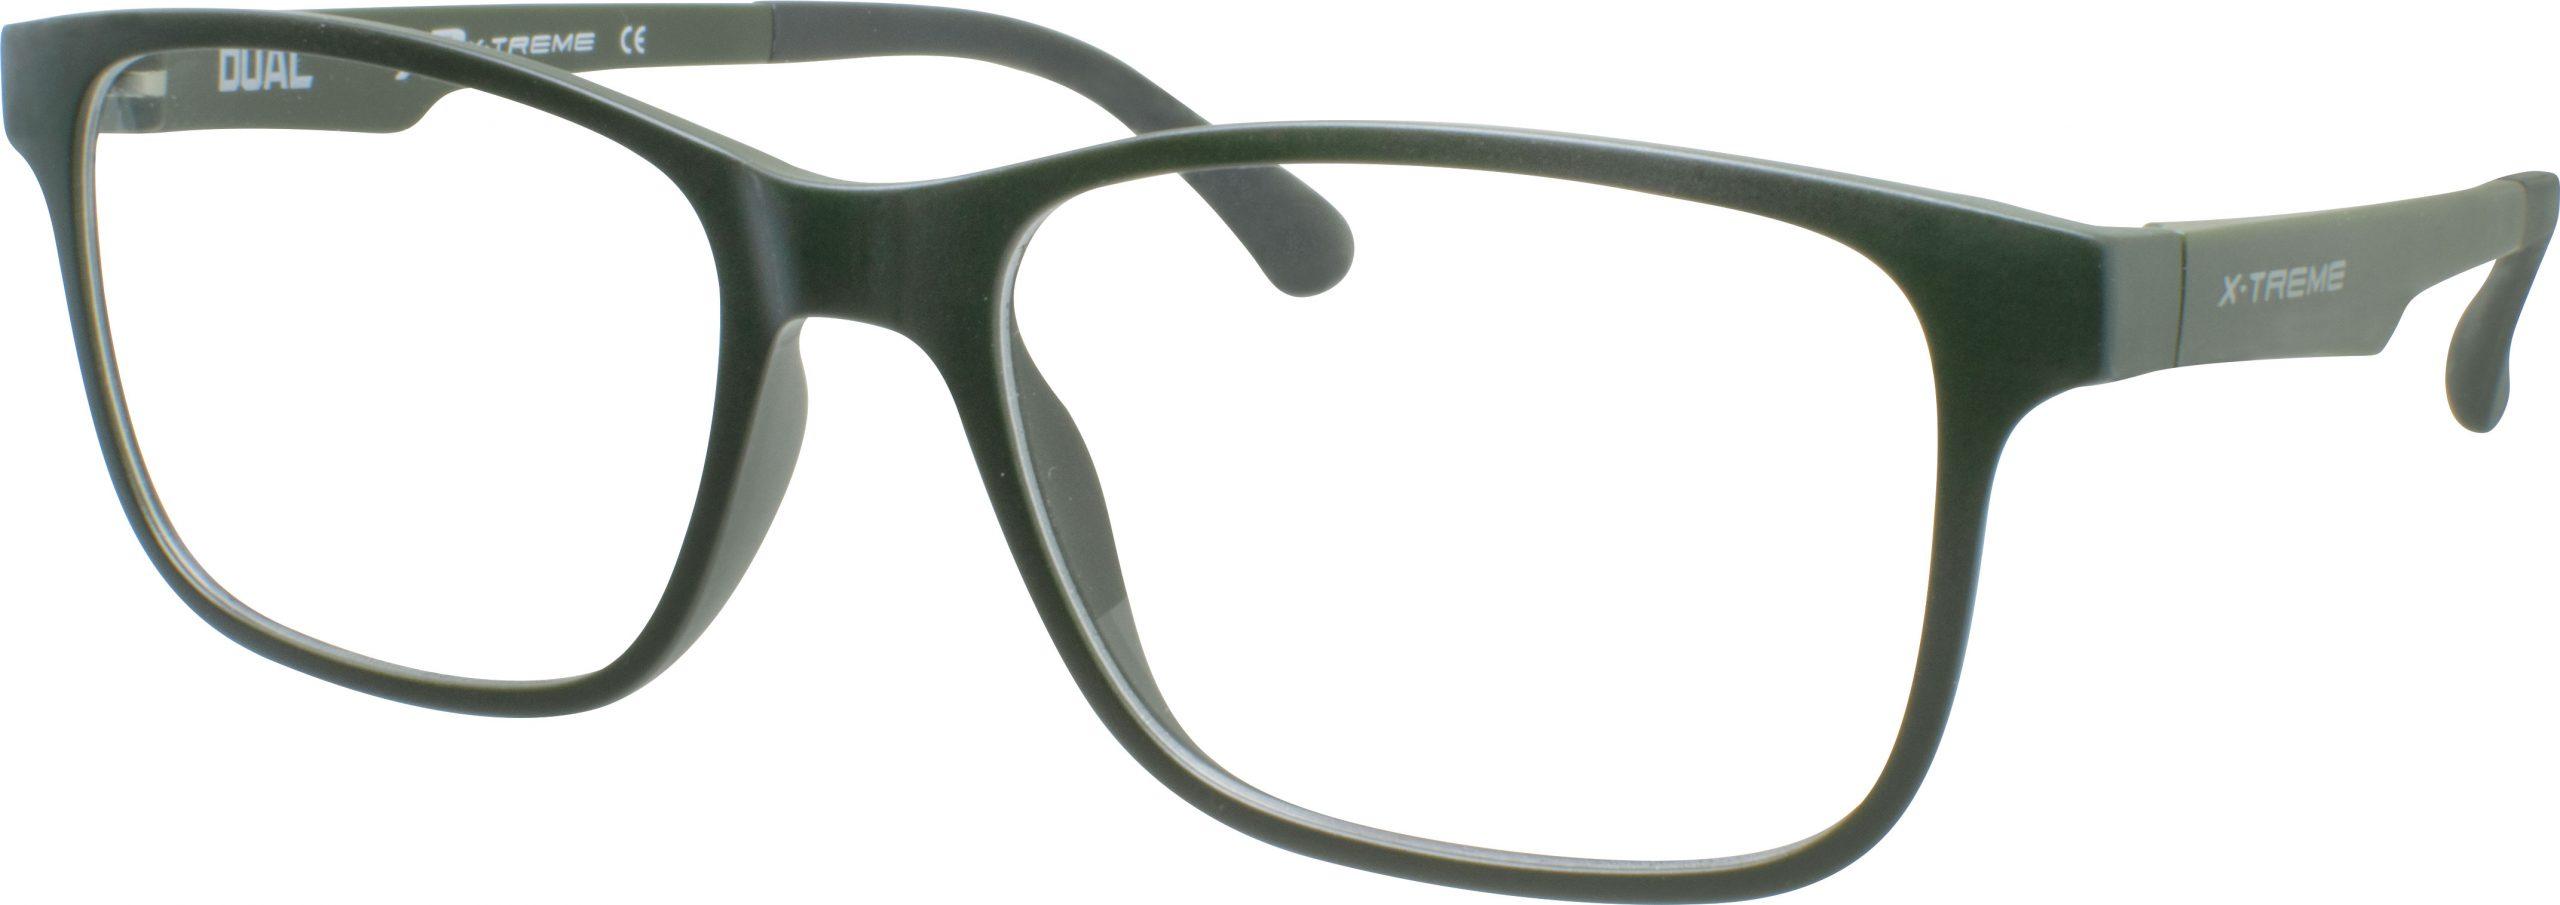 xtreme-dual-verde (3)